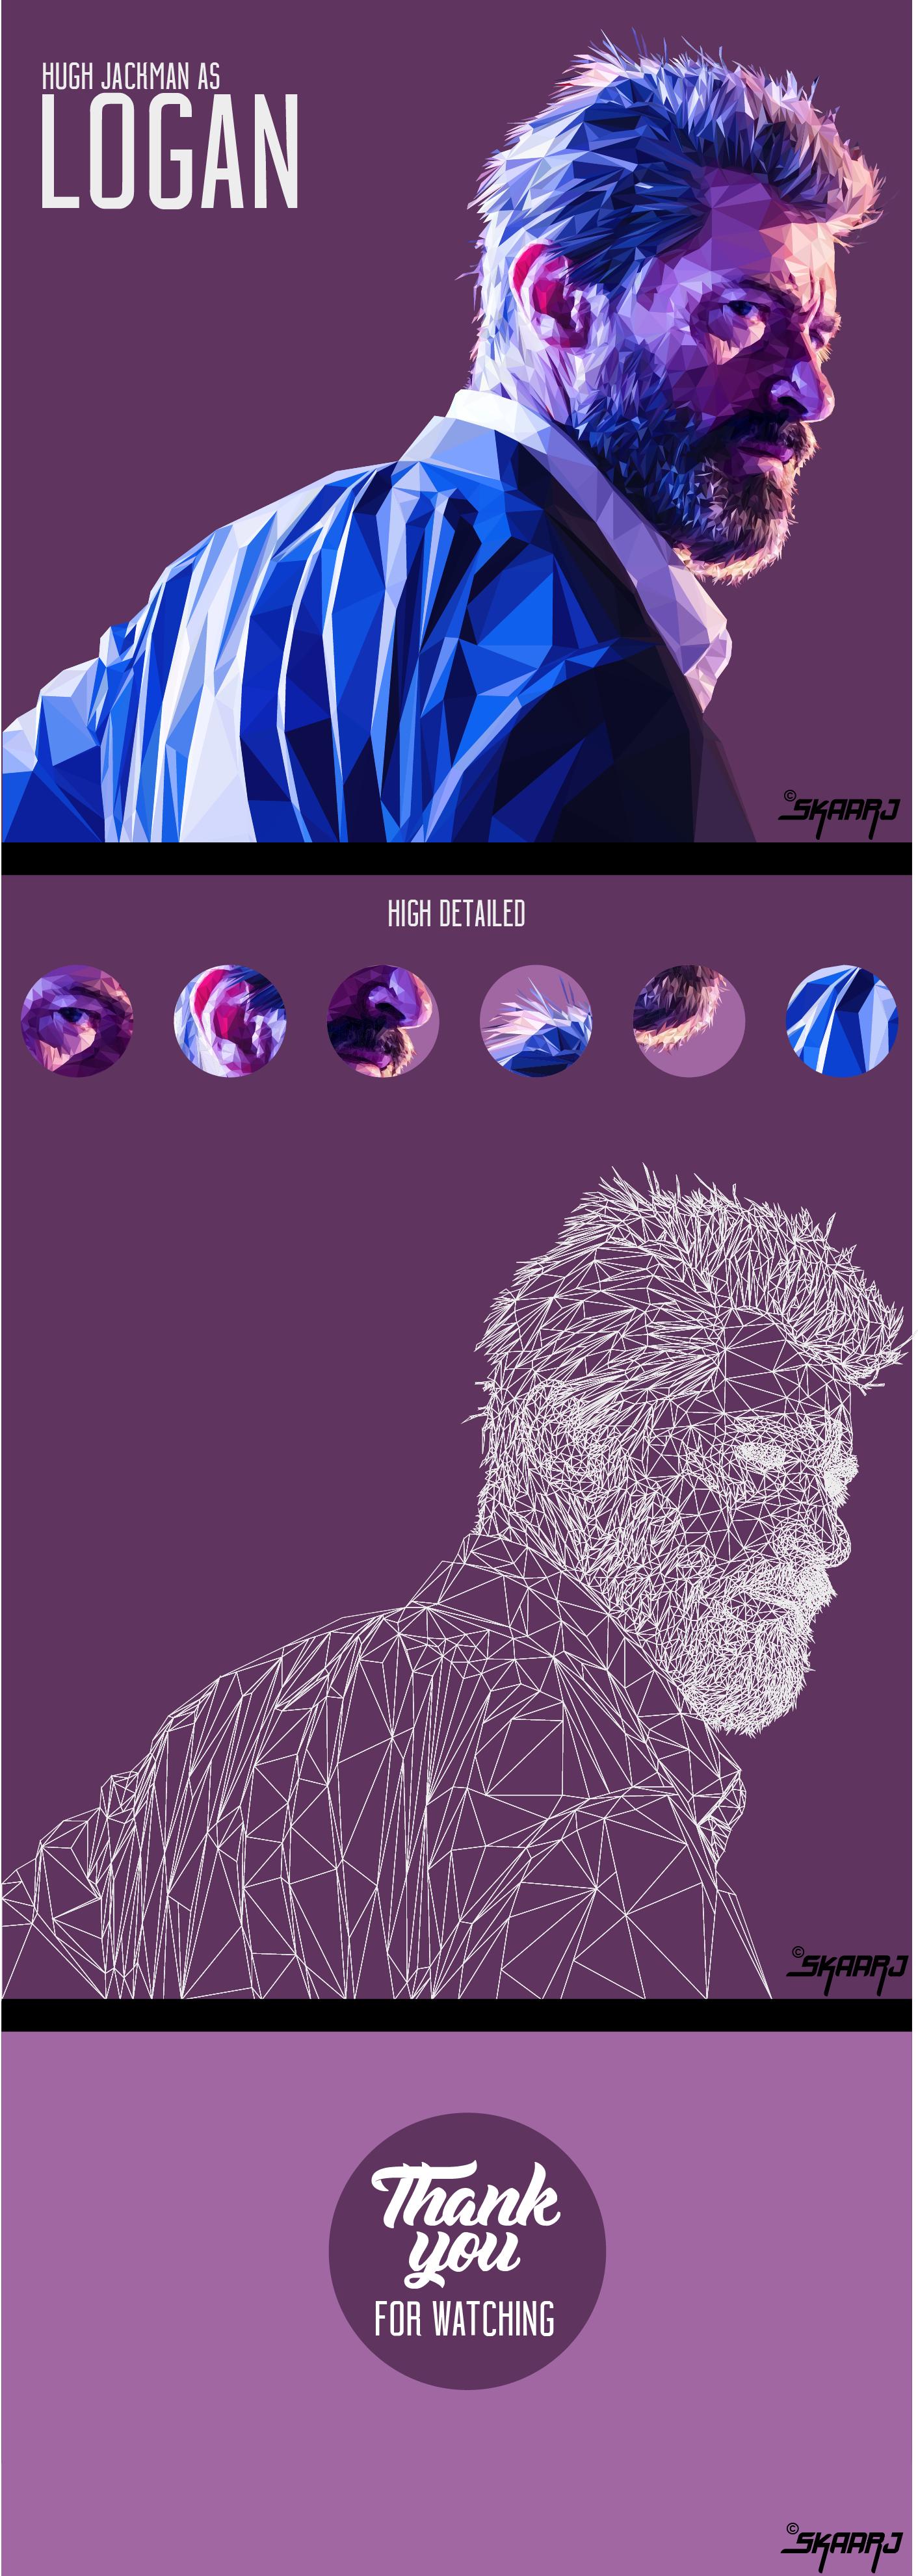 "Check out this @Behance project: ""LOGAN / Hugh Jackman - Low poly digital portrait"" https://www.behance.net/gallery/50344855/LOGAN-Hugh-Jackman-Low-poly-digital-portrait"